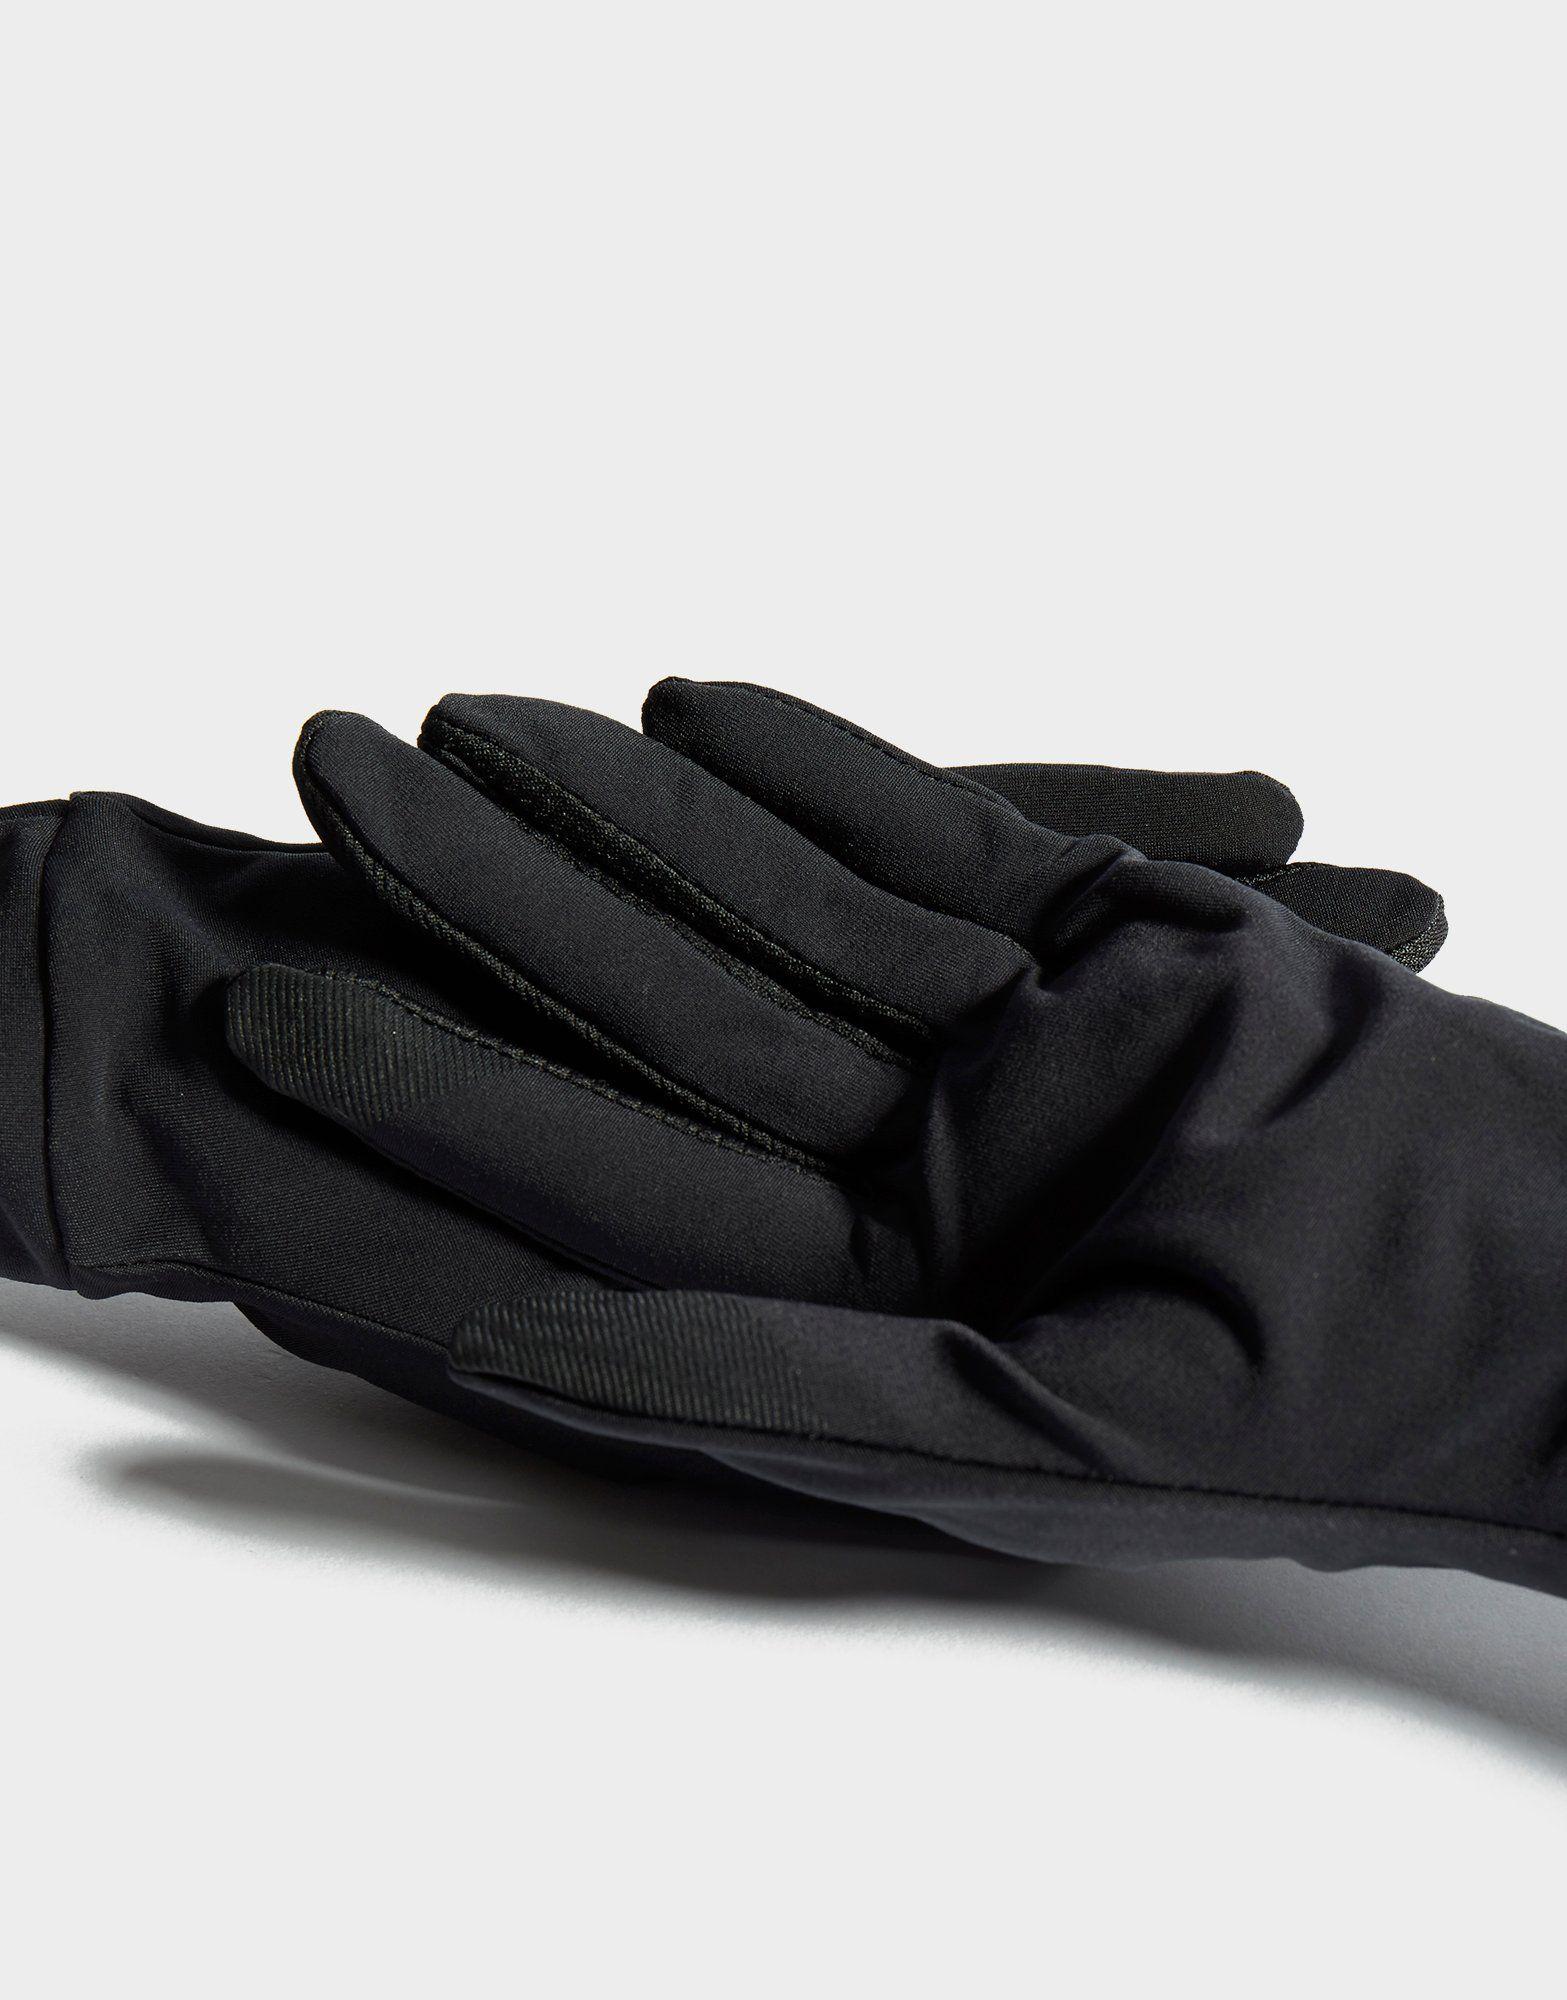 Nike guantes Lightweight Tech